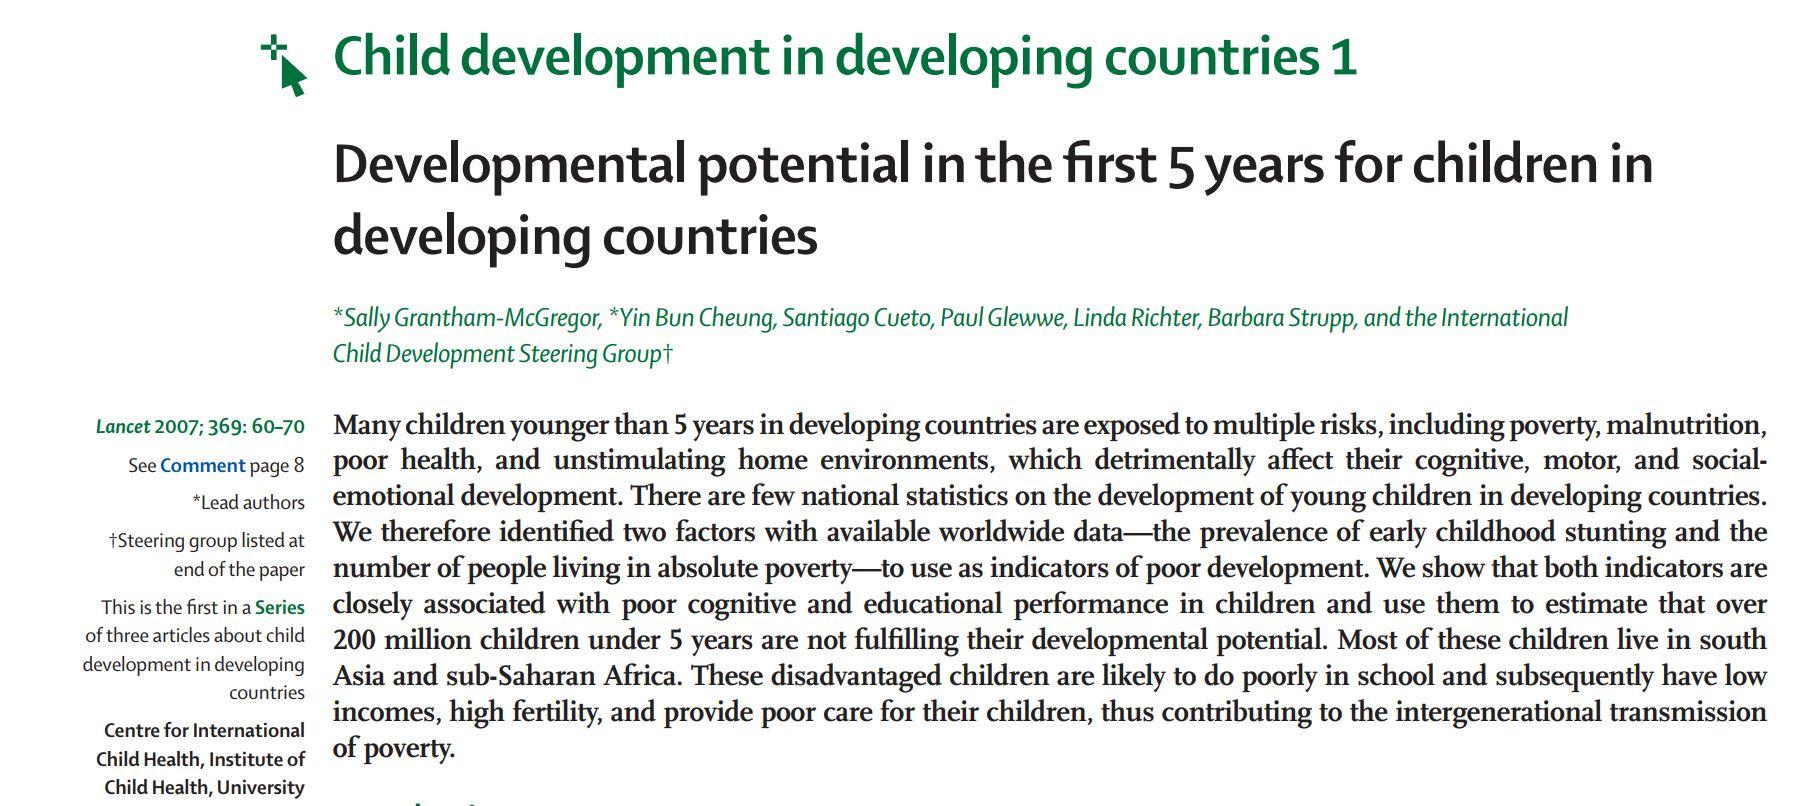 ninitest.com |     ما دیگر نمی توانیم عدم تحرک را توجیه کنیم.پتانسیل تکاملی کودکان زیر پنج سال در کشورهای در حال توسعه